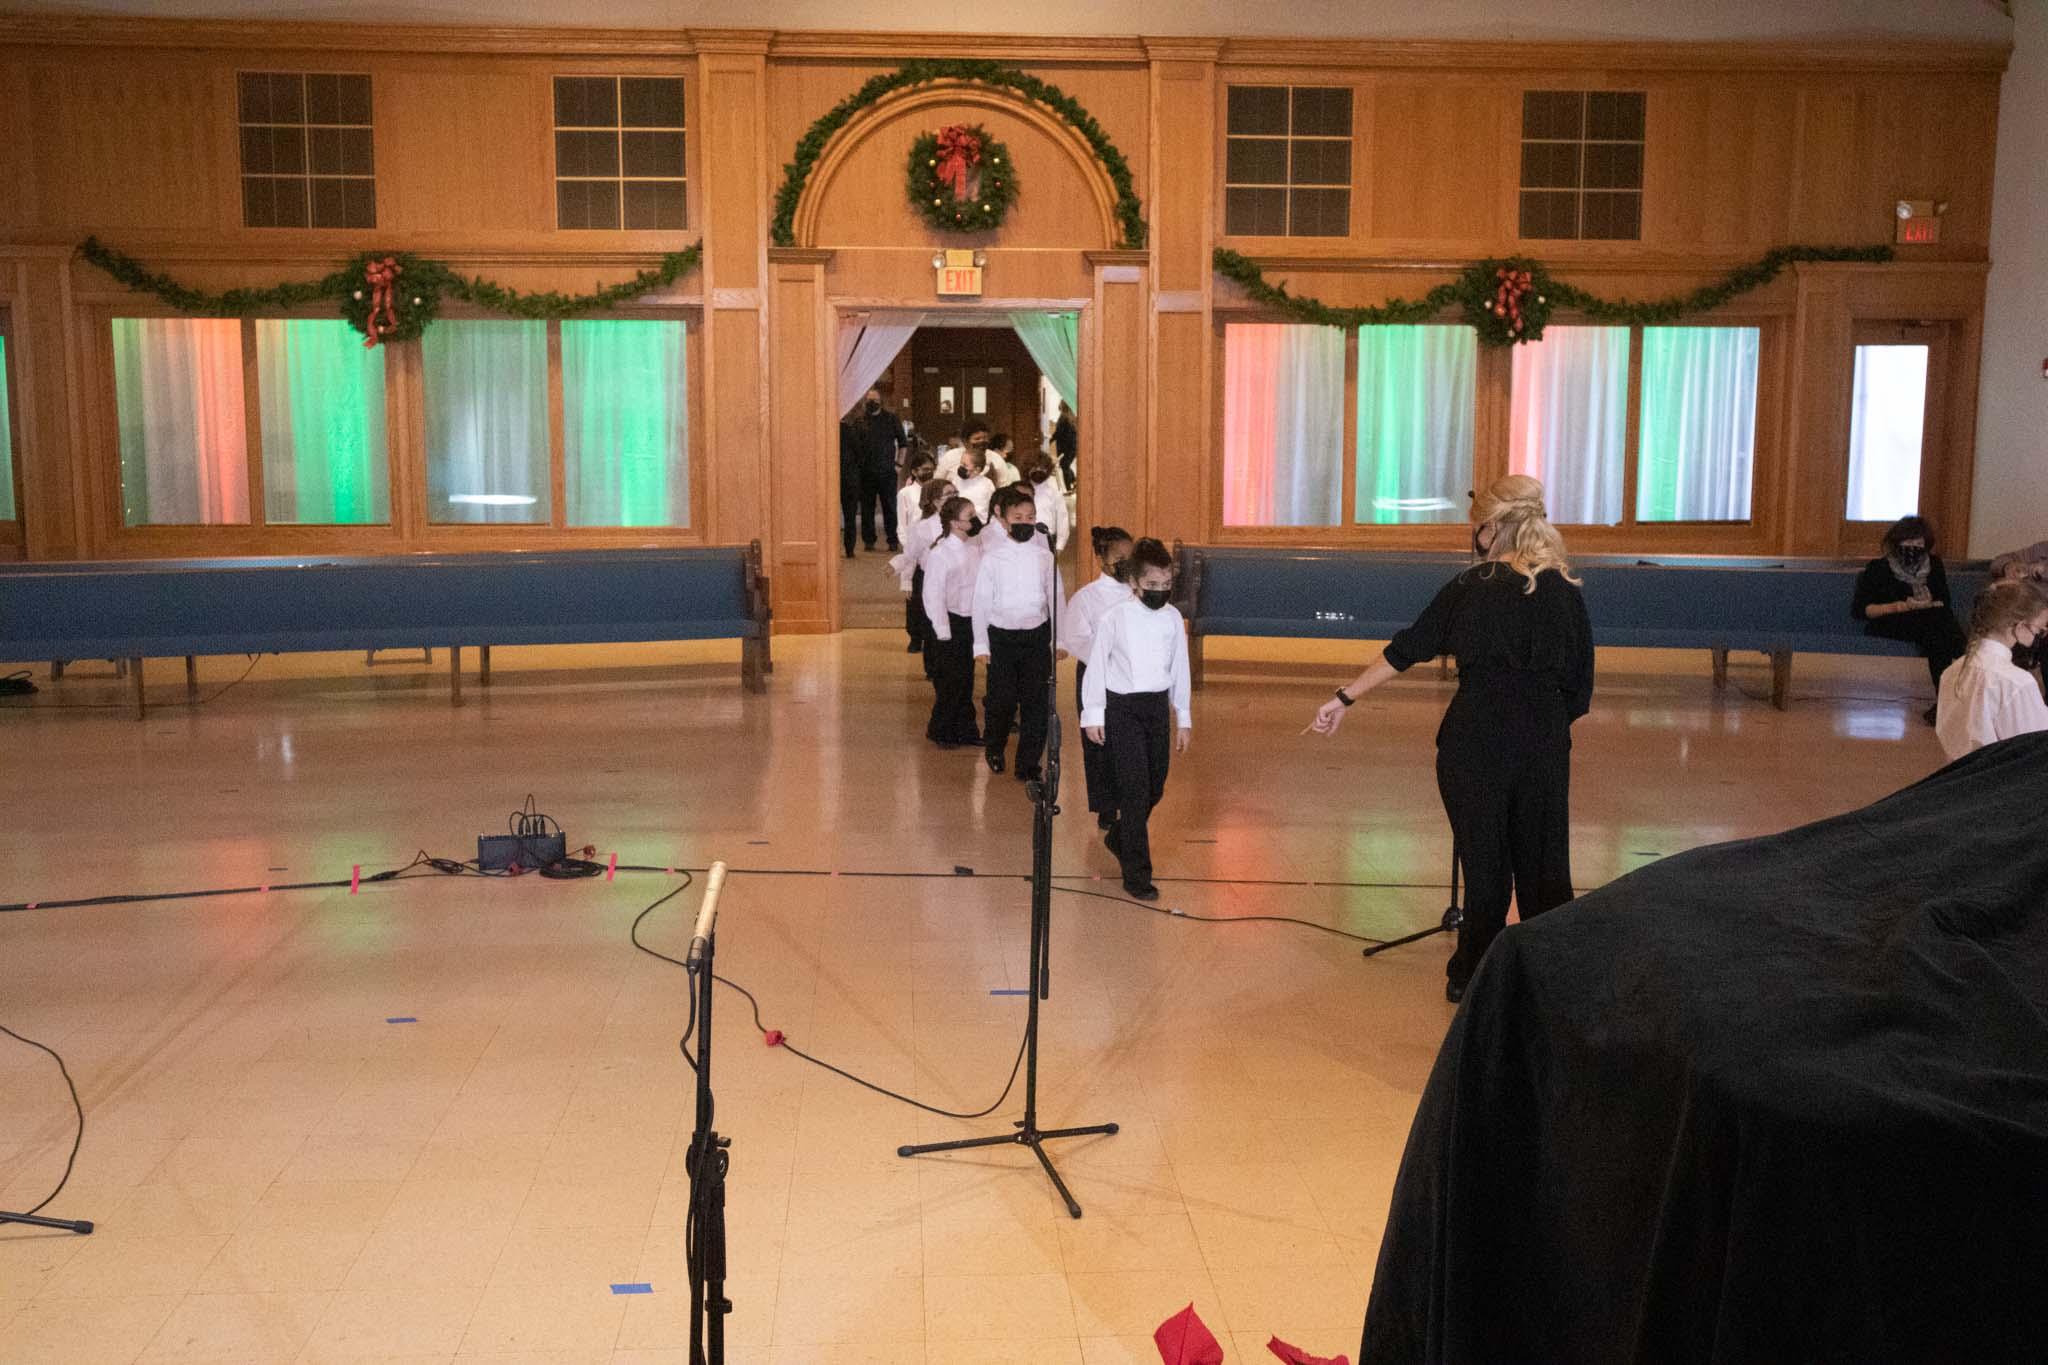 Children's Choir 1A coming in